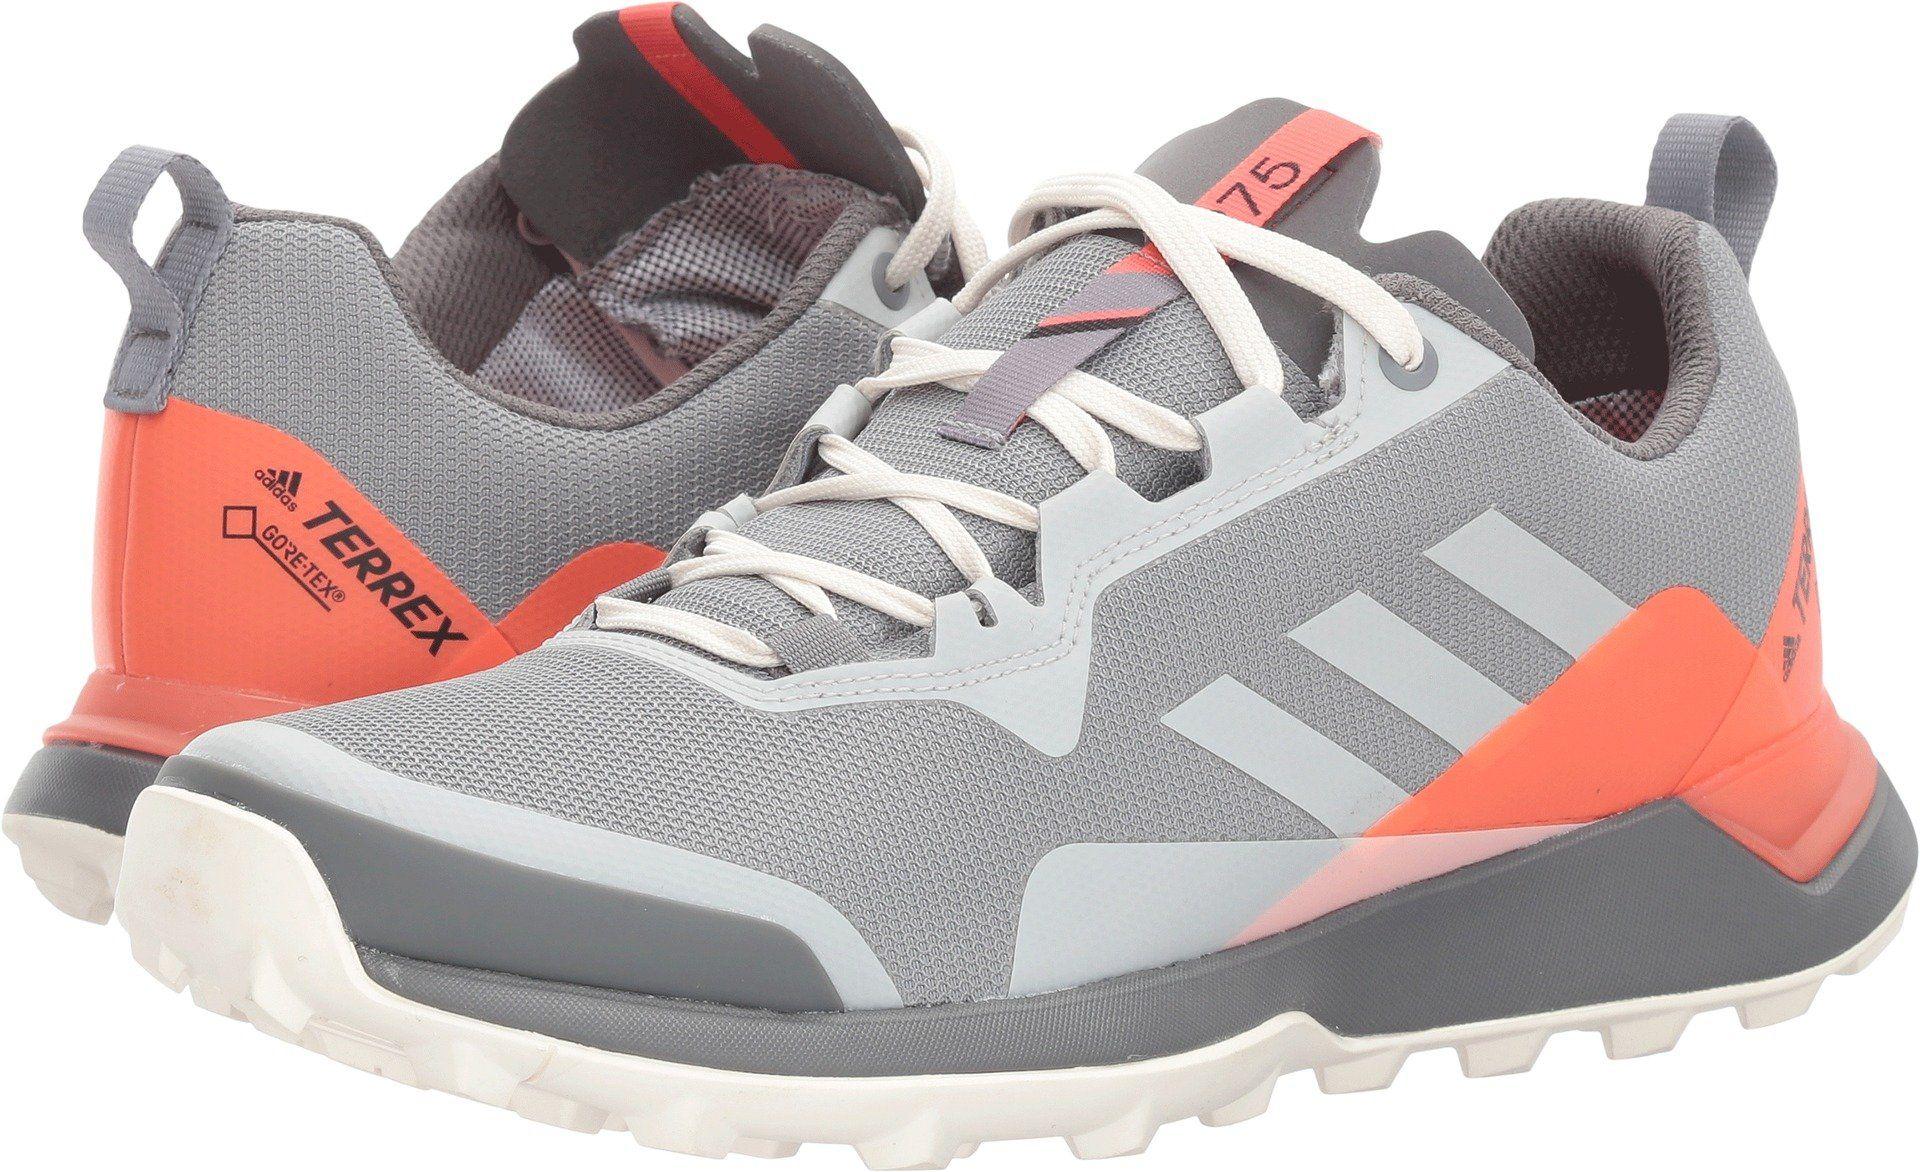 5c579d7716 adidas Outdoor Womens Terrex CMTK GTX Grey Three/Chalk White/Easy ...